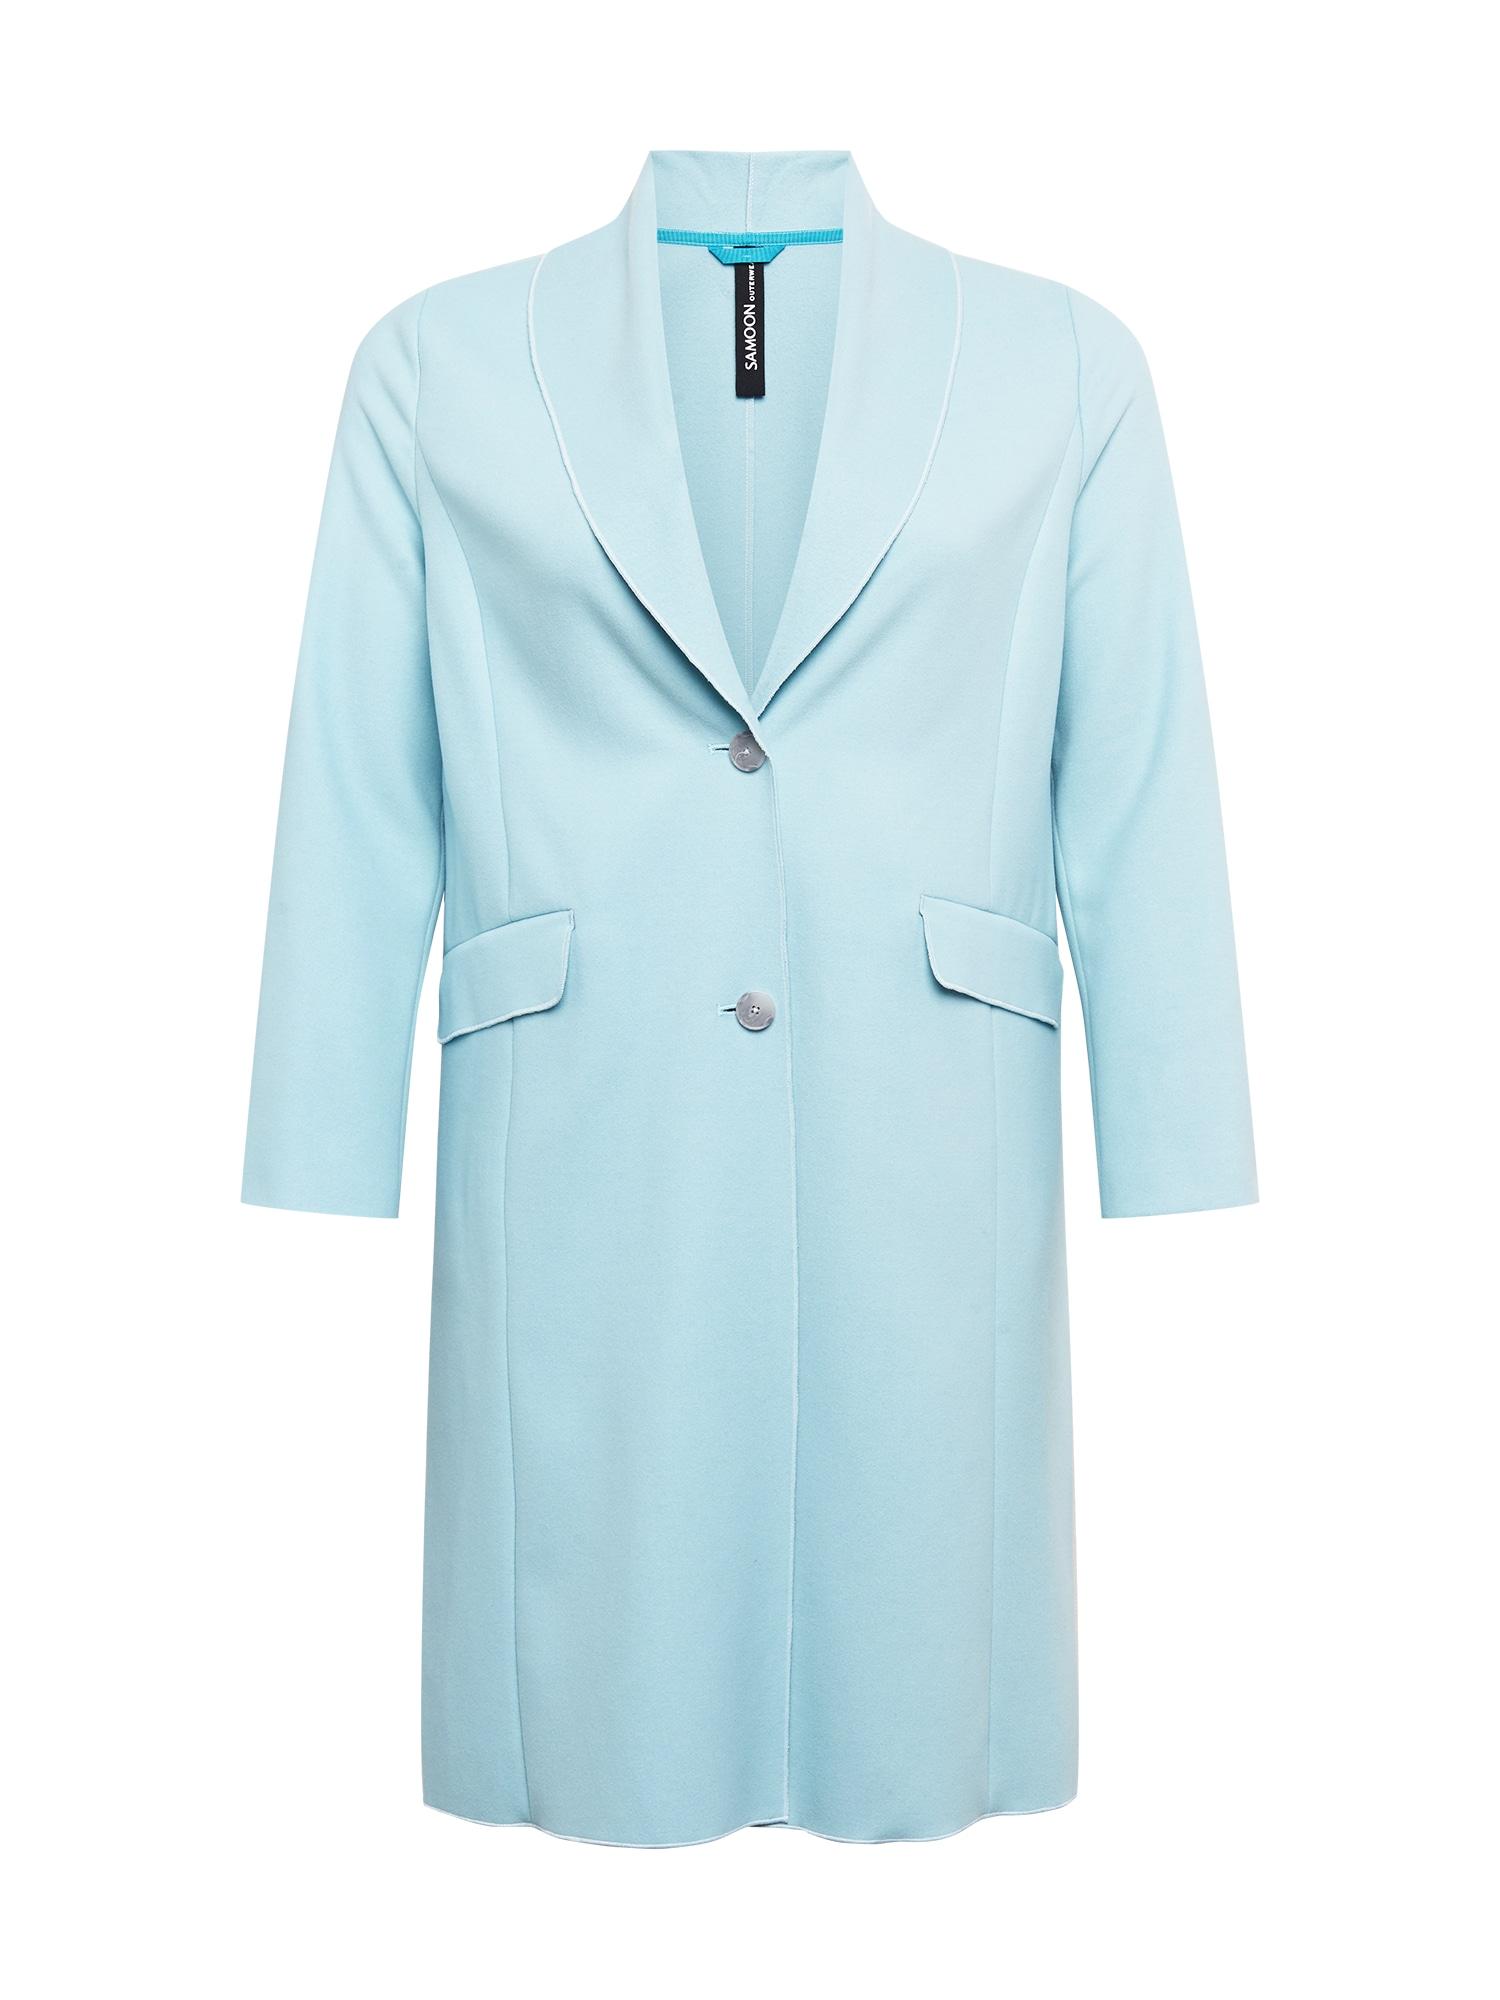 SAMOON Demisezoninis paltas